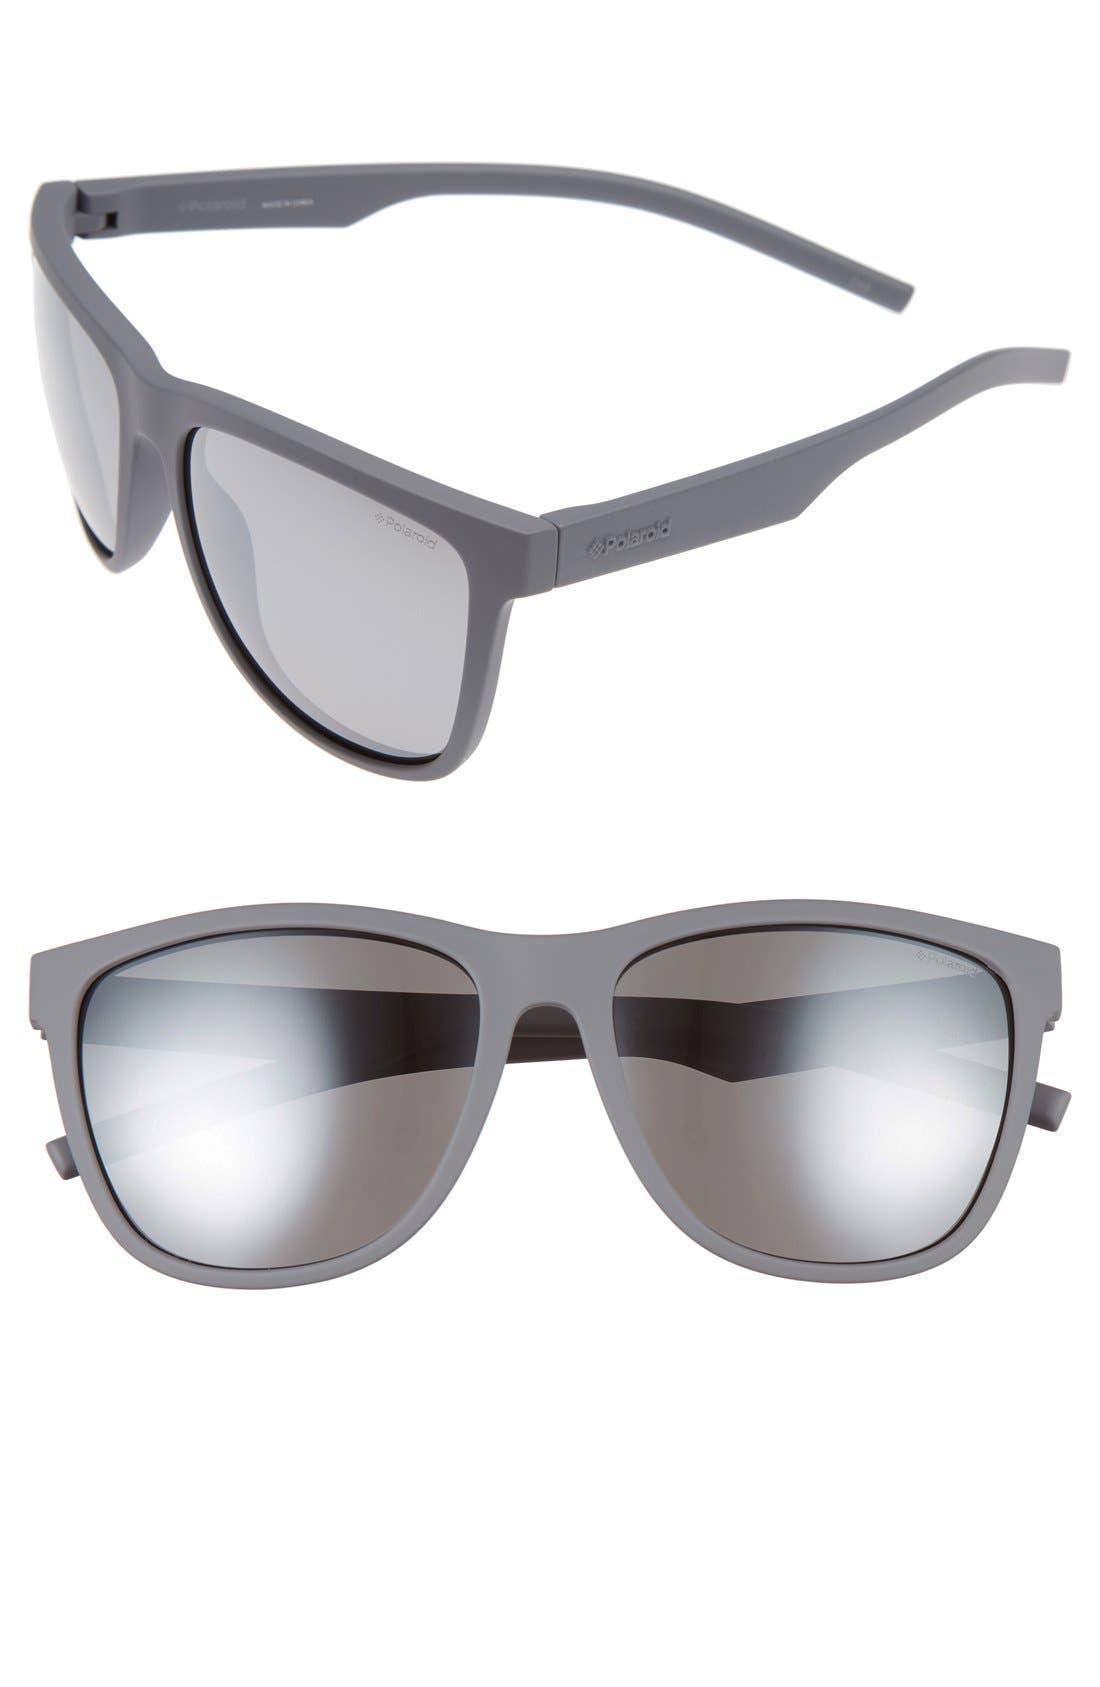 Alternate Image 1 Selected - Polaroid 6014/S 56mm Polarized Sunglasses